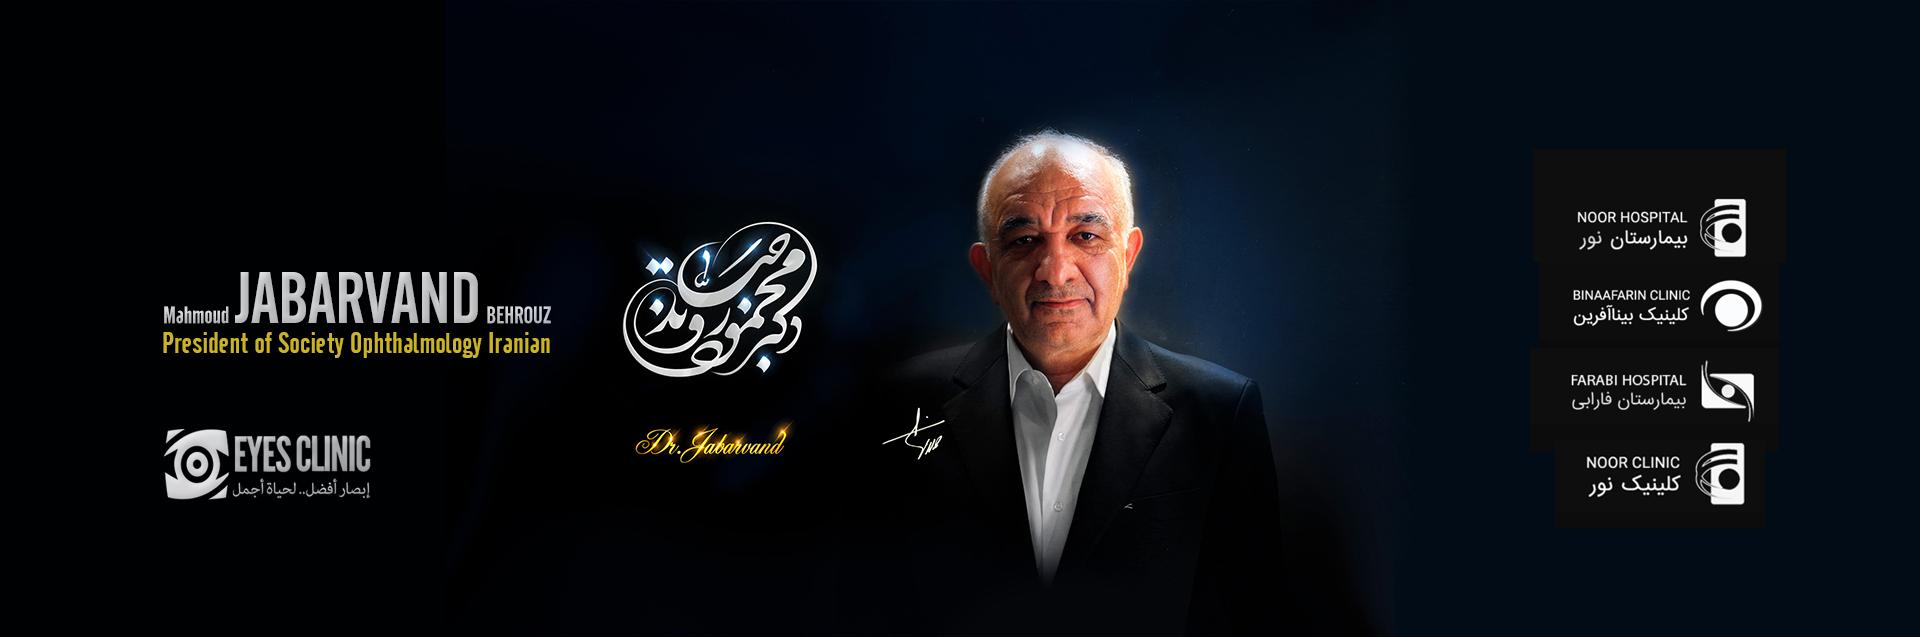 البروفسور محمود جباروند